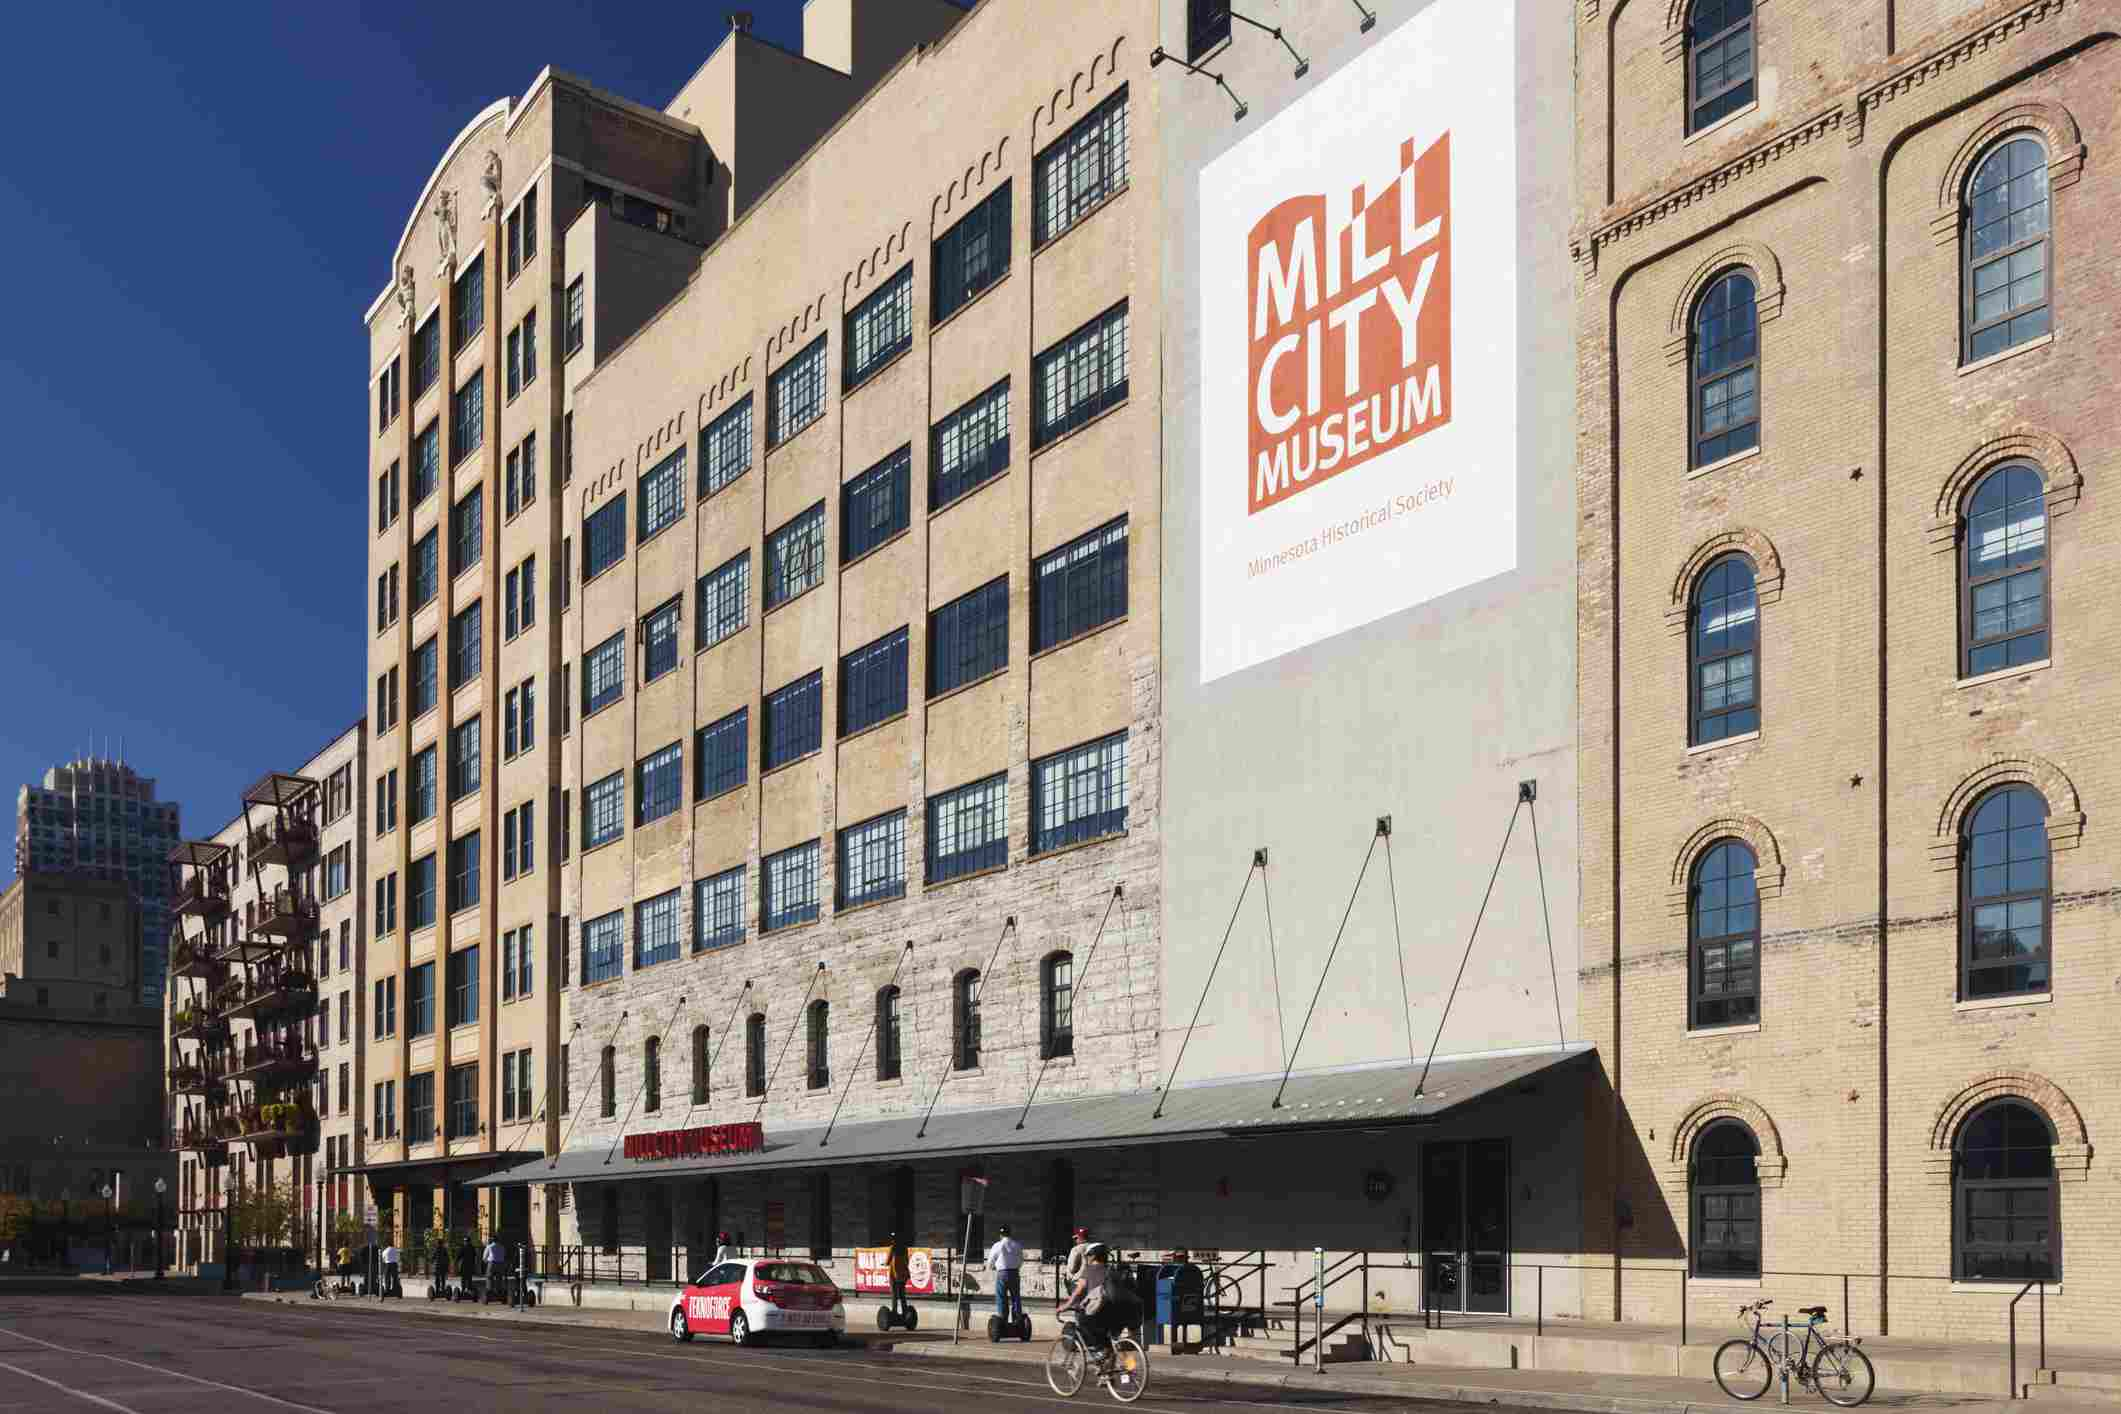 USA, Minnesota, Minneapolis, Mill City Museum, exterior